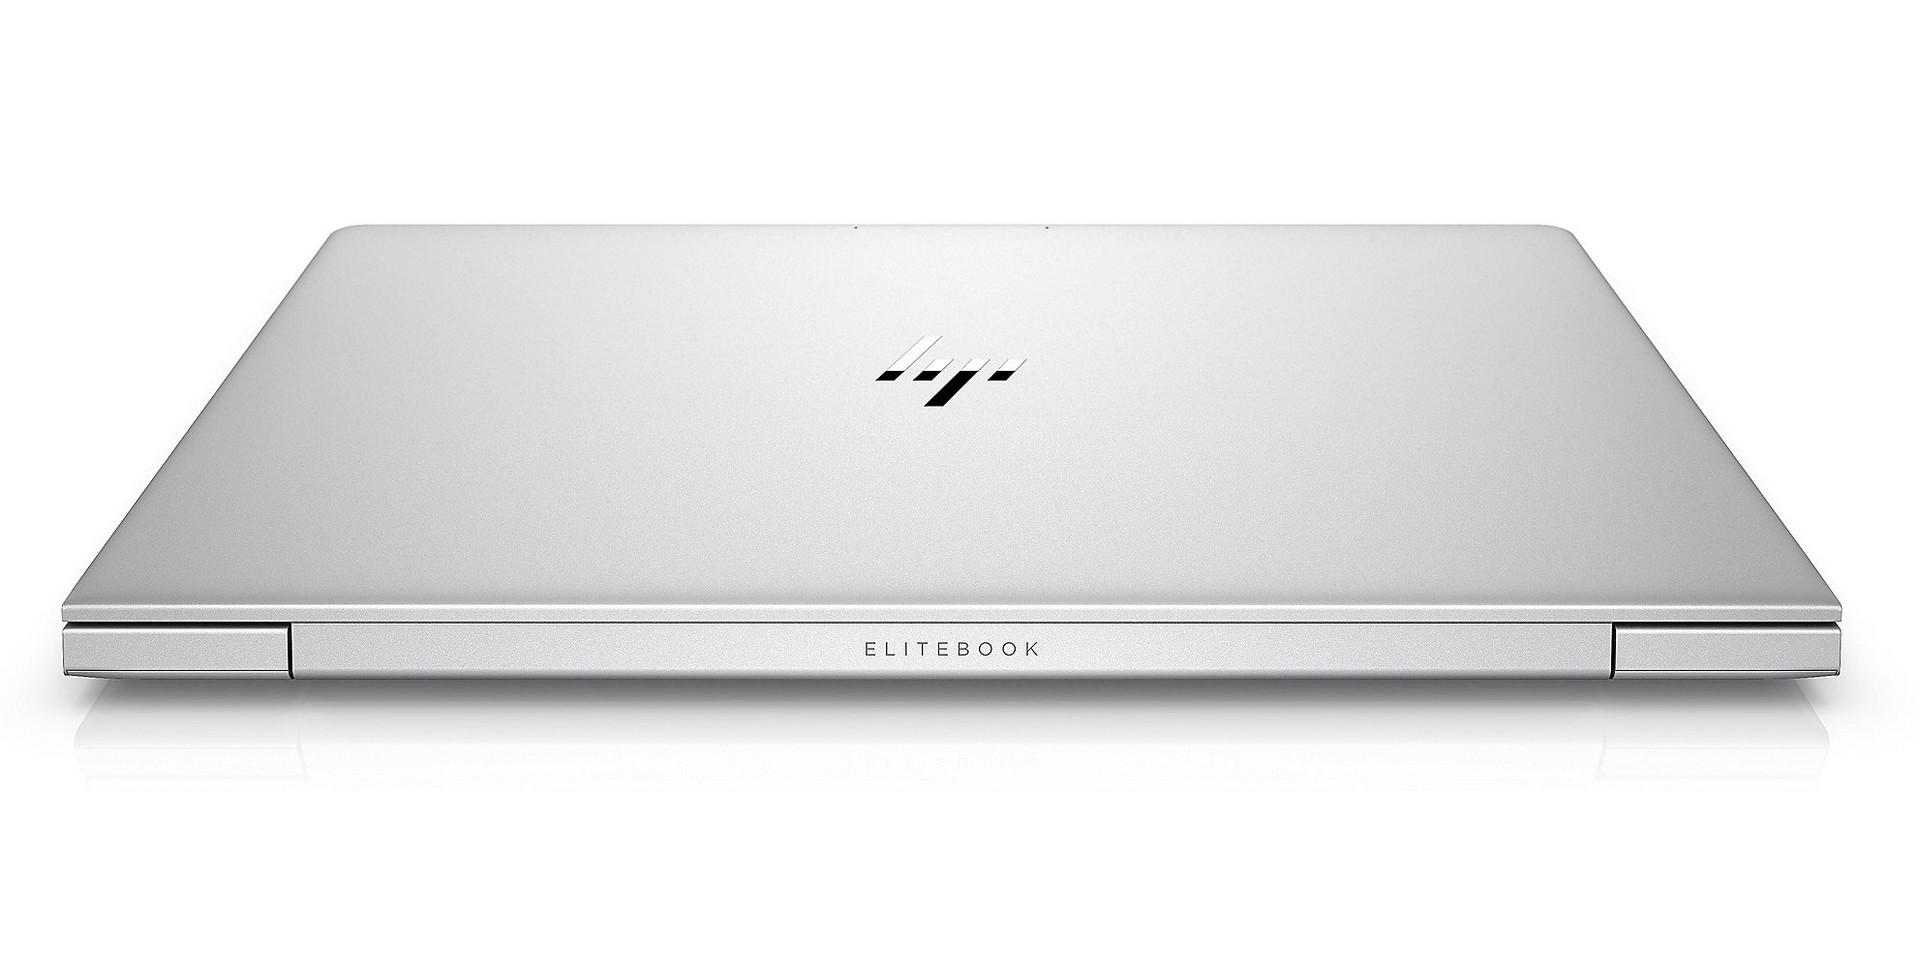 HP EliteBook 840 G5 (i7-8550U, SSD, FHD) Laptop Review